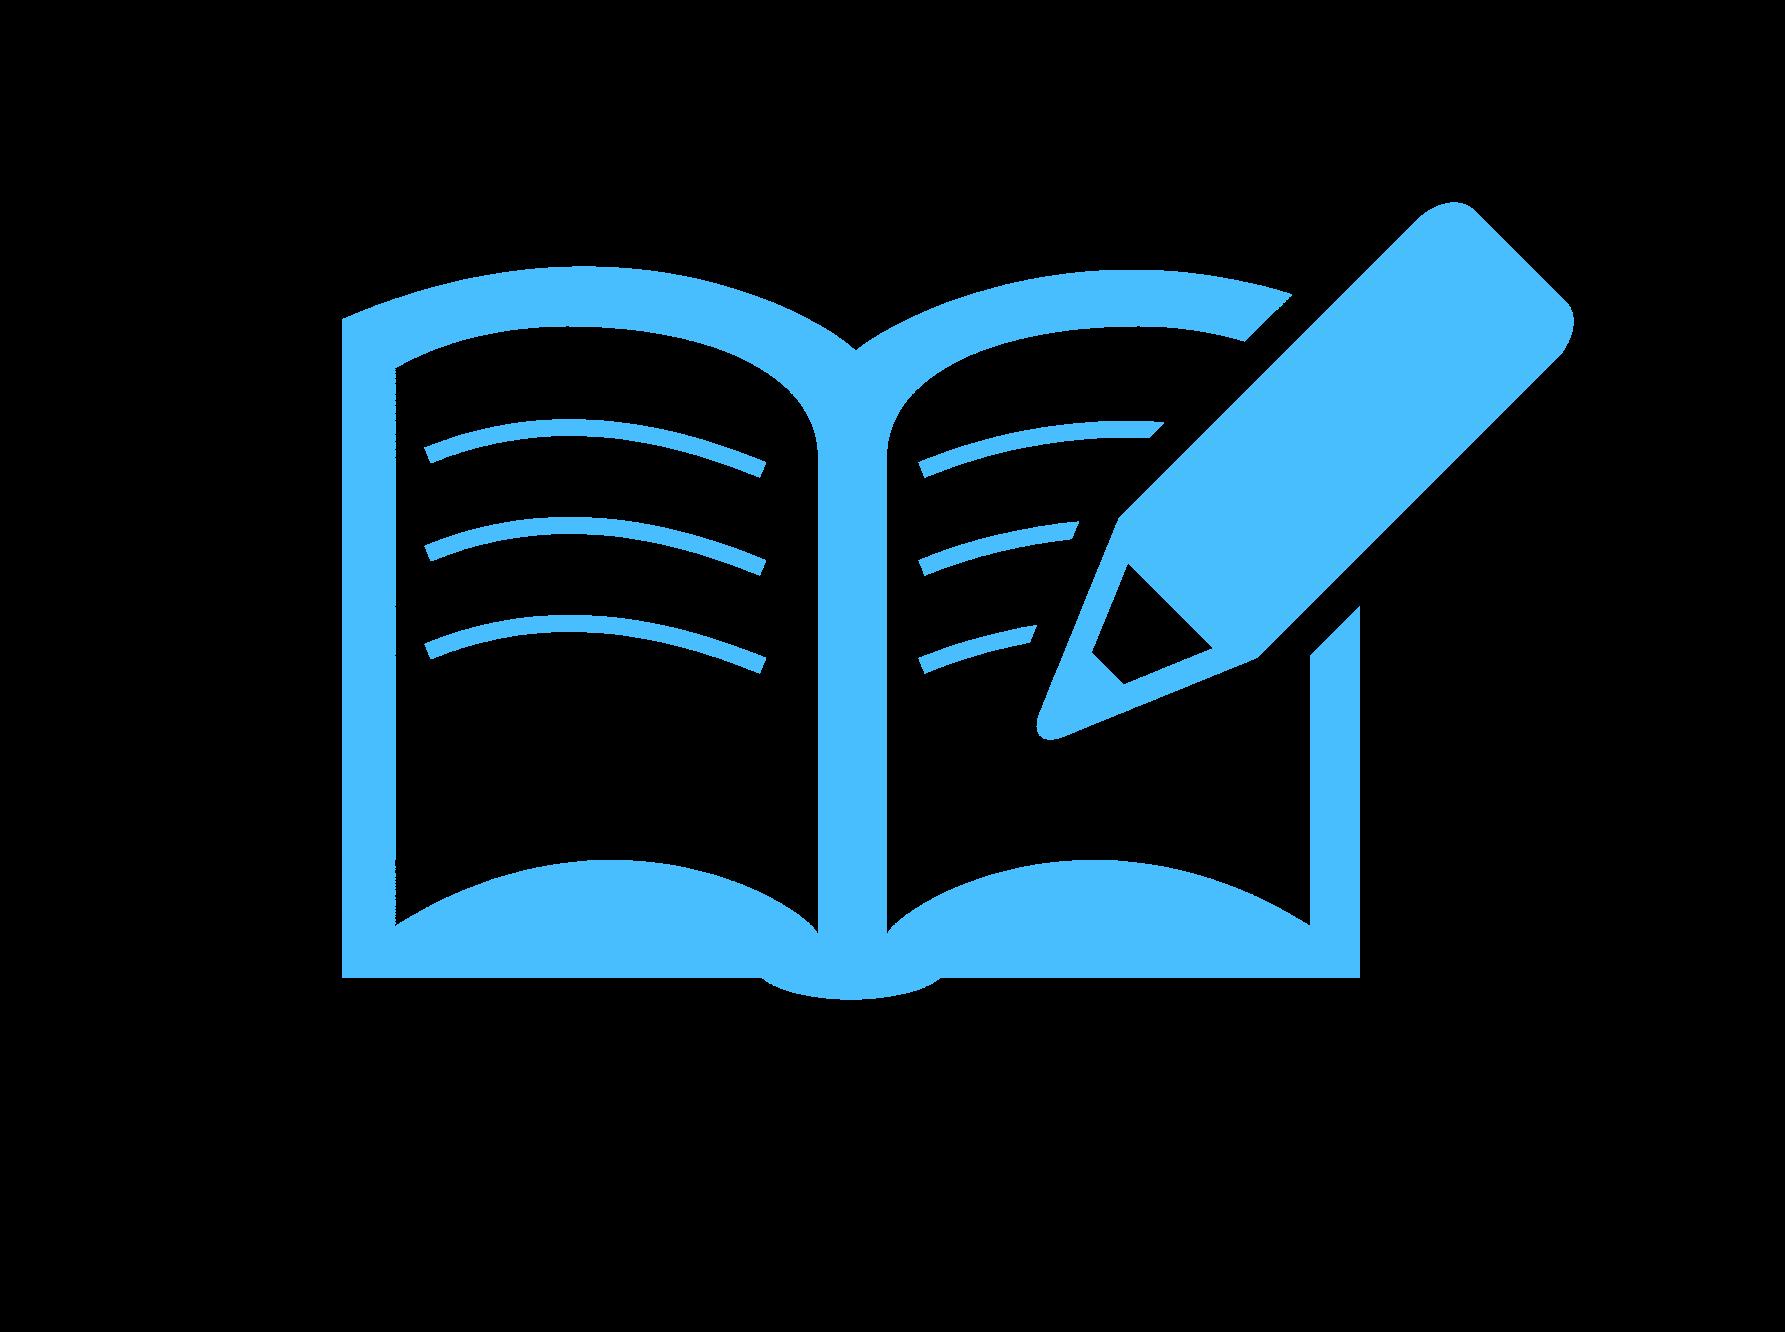 logo (1) copy.png